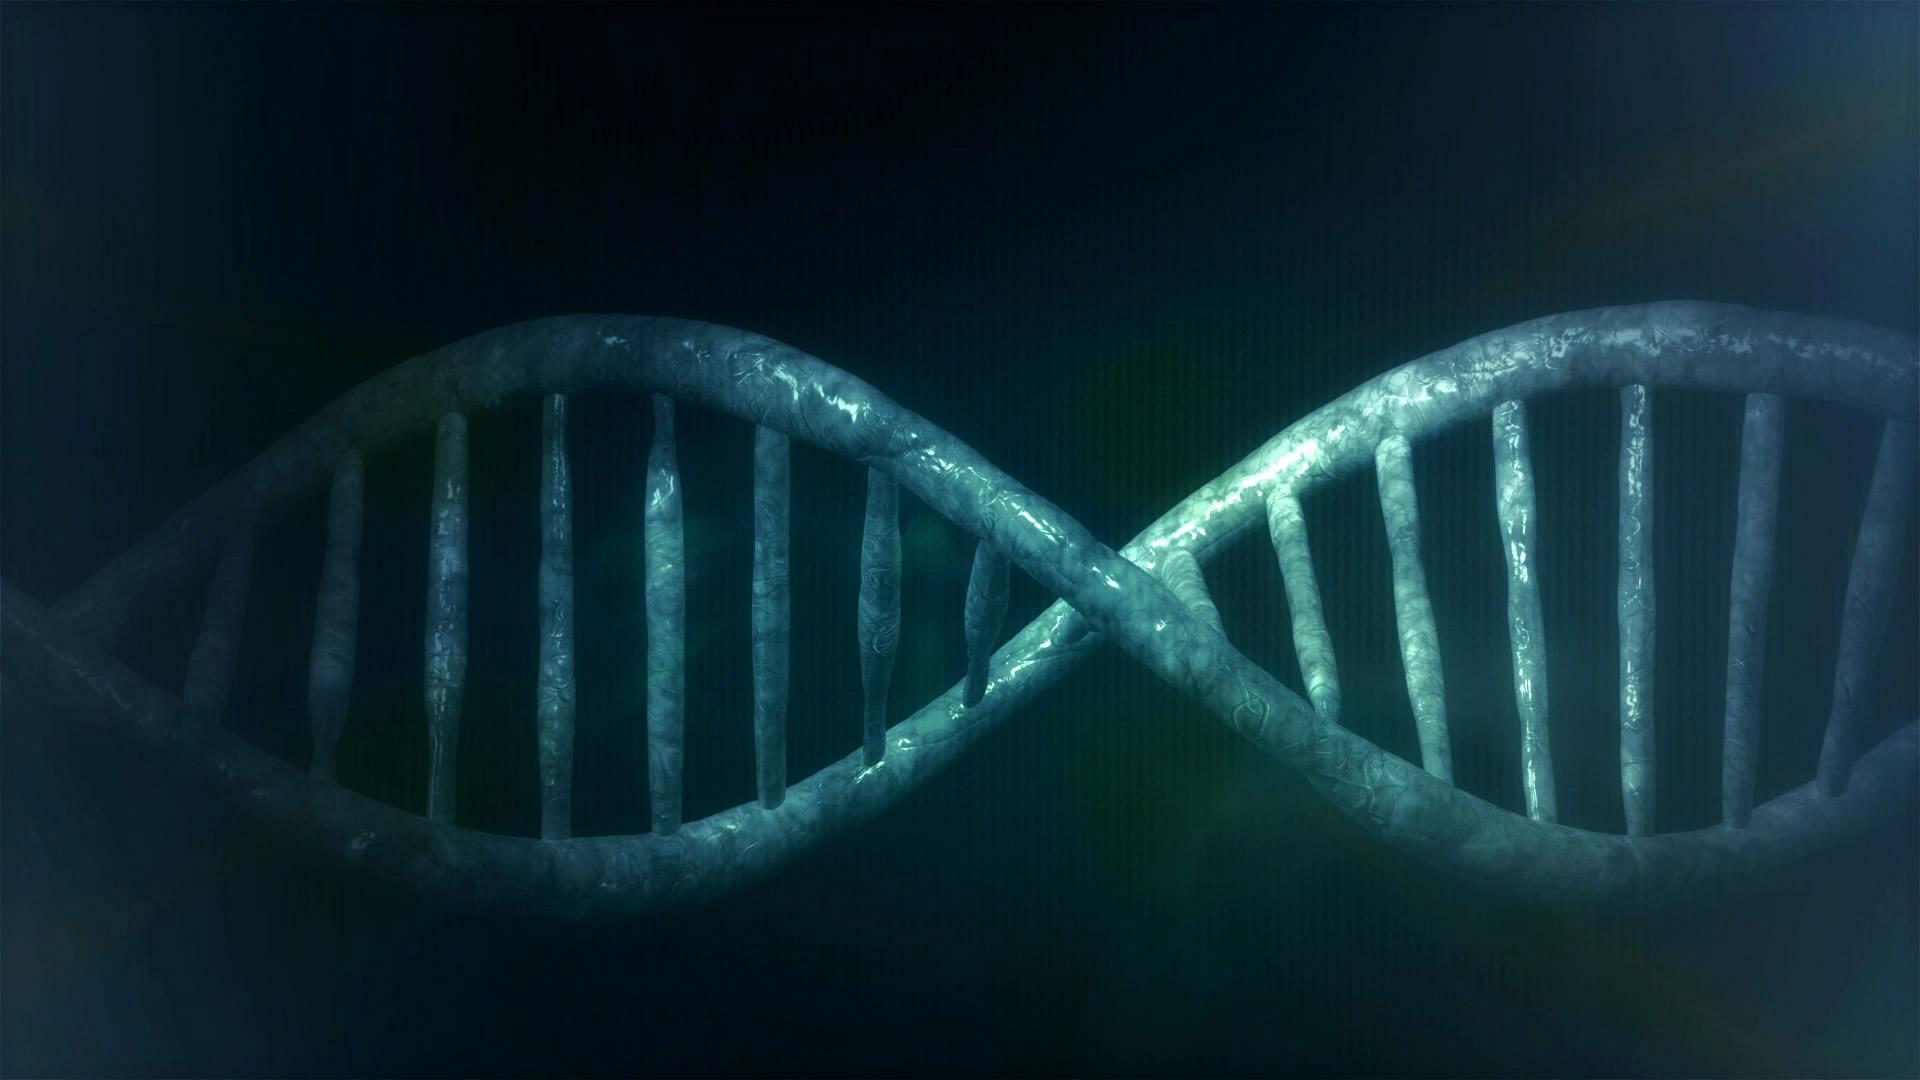 Mutation (ADN - publicdomainpictures.net)